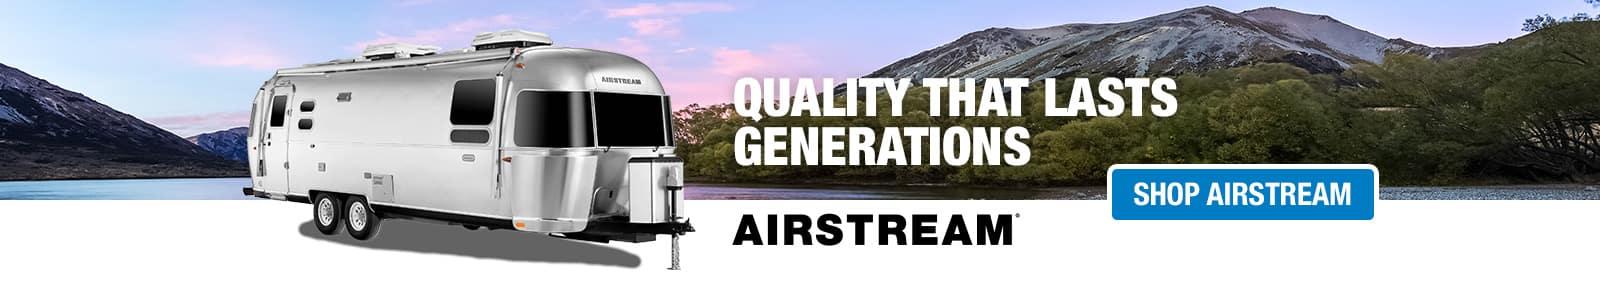 airstreamqualitythatlastsgenerations